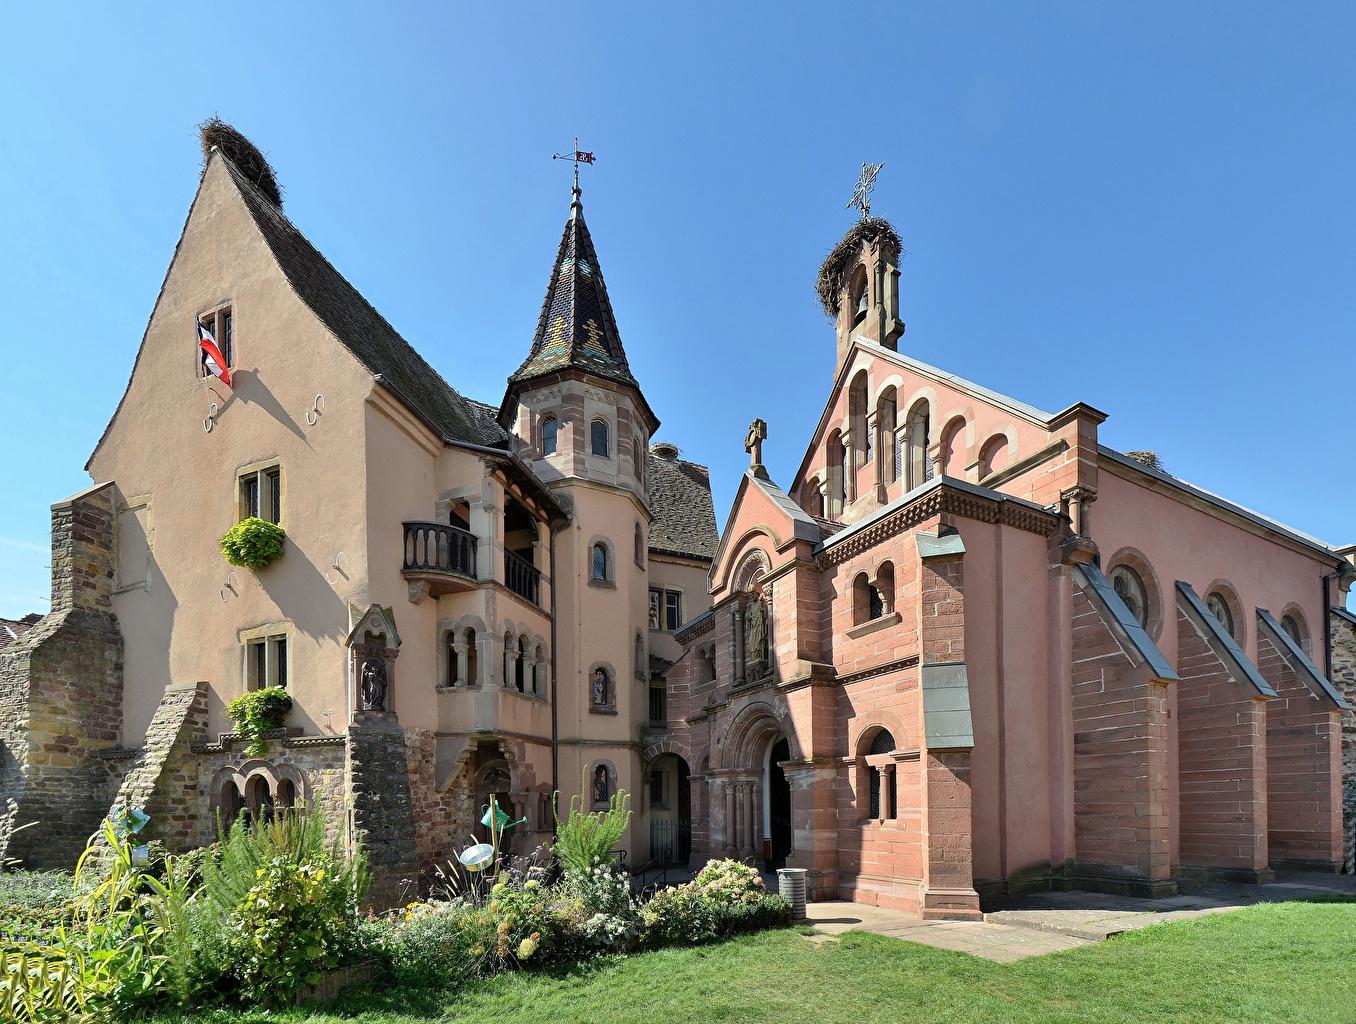 Картинки Франция Eguisheim Saint-Leon Castle Замки город Дизайн замок Города дизайна